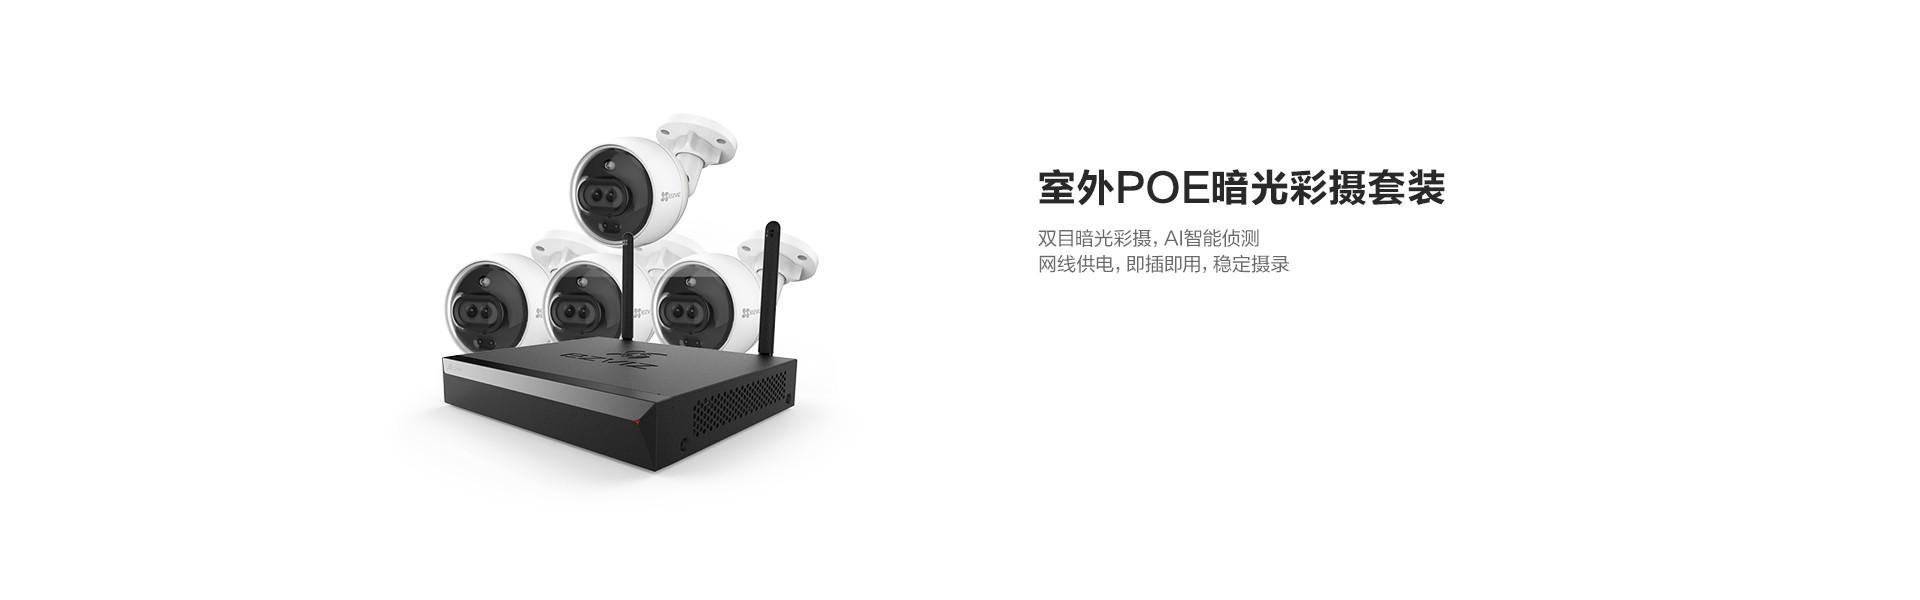 C3X-POE-pc.jpg